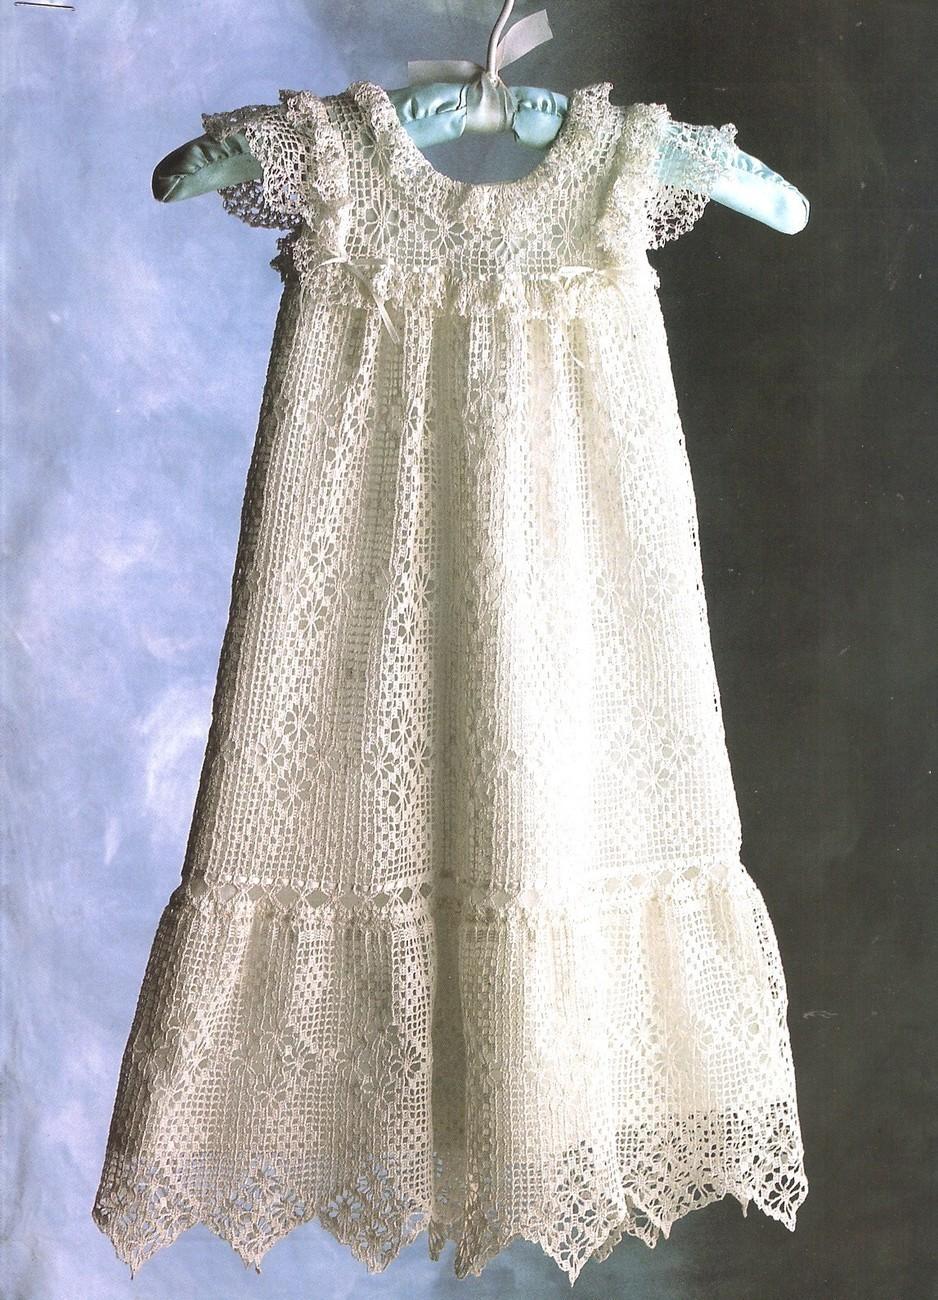 Crochet Pattern For Christening Gown : Christening Gown Crochet Garden Boutique Quality Patterns ...